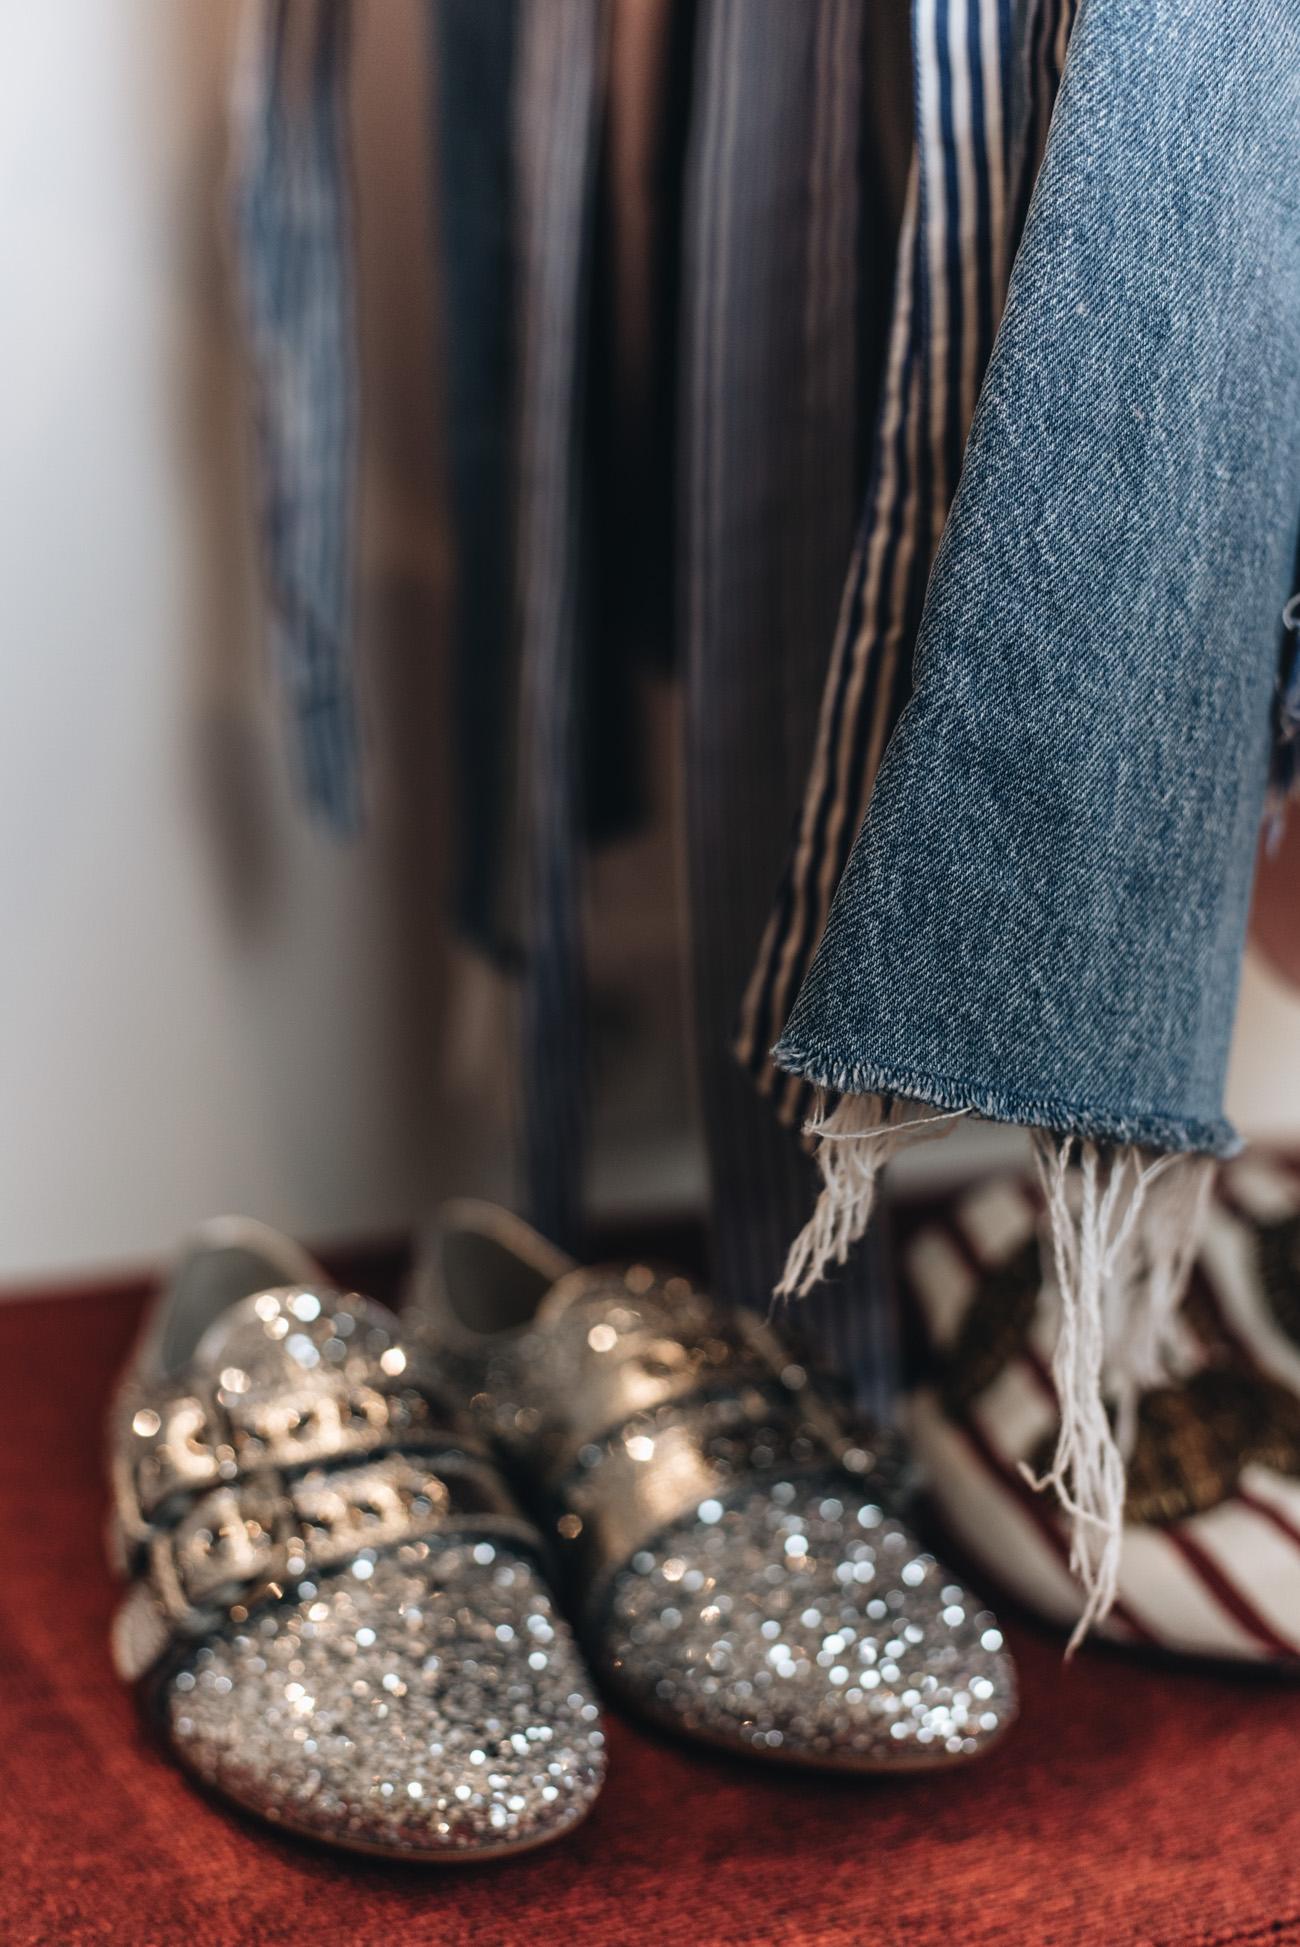 miu-miu-glitzer-schuhe-silber-balenciaga-ceinture-cut-out-boots-weiß-dolce-und-gabbana-rote-samt-high-heels-fashiioncarpet